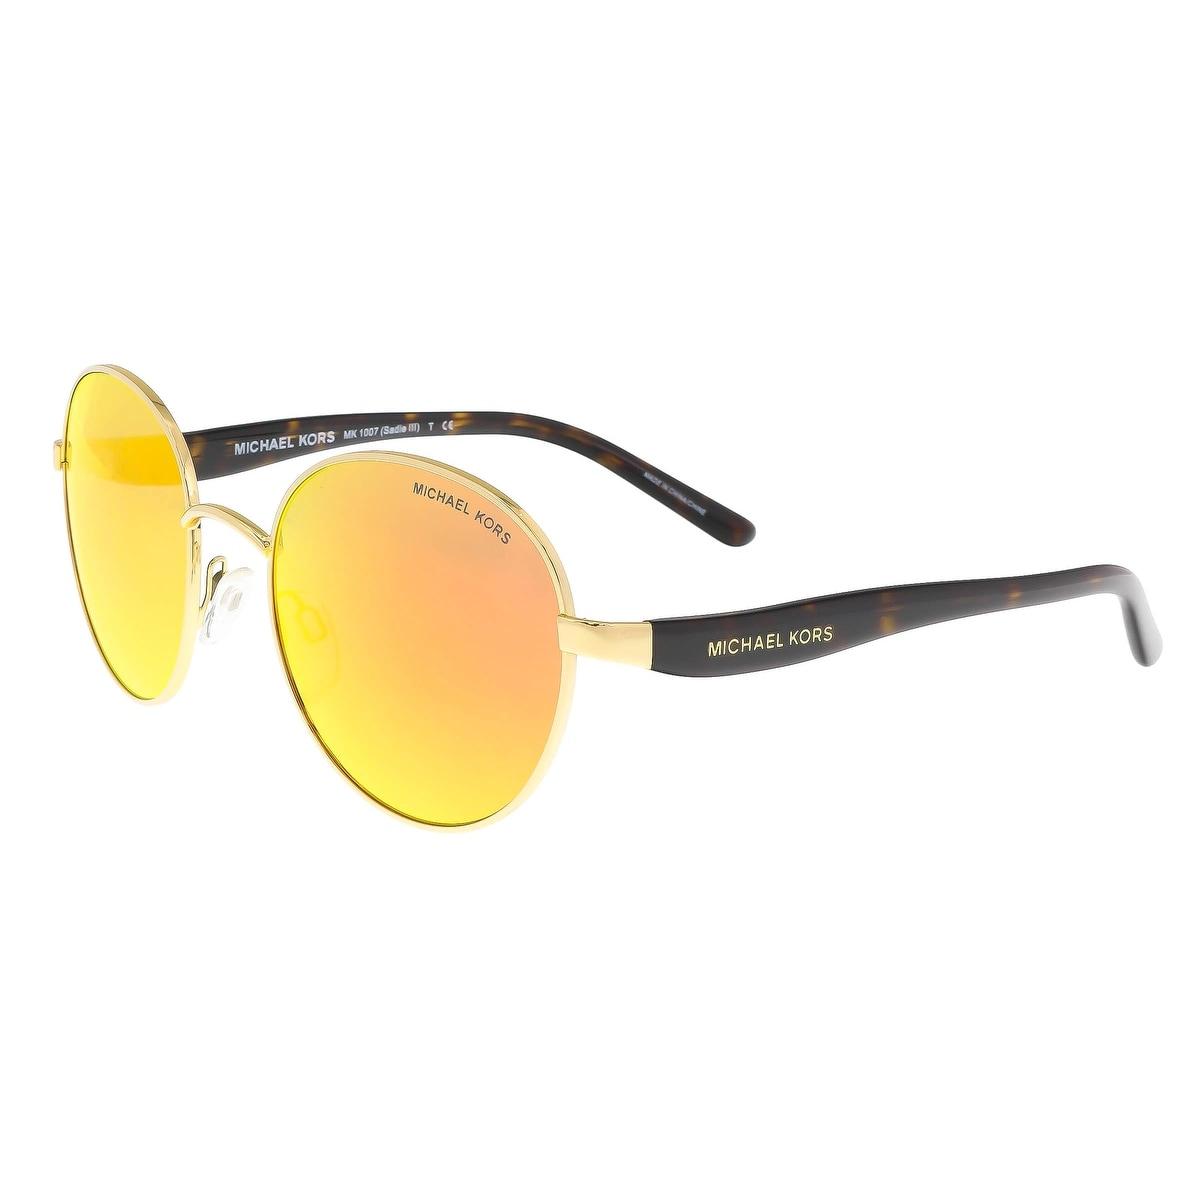 97cfad2a6b57 Michael Kors MK1007 10246Q SADIE III Gold/Tortoise Round Sunglasses -  52-19-135